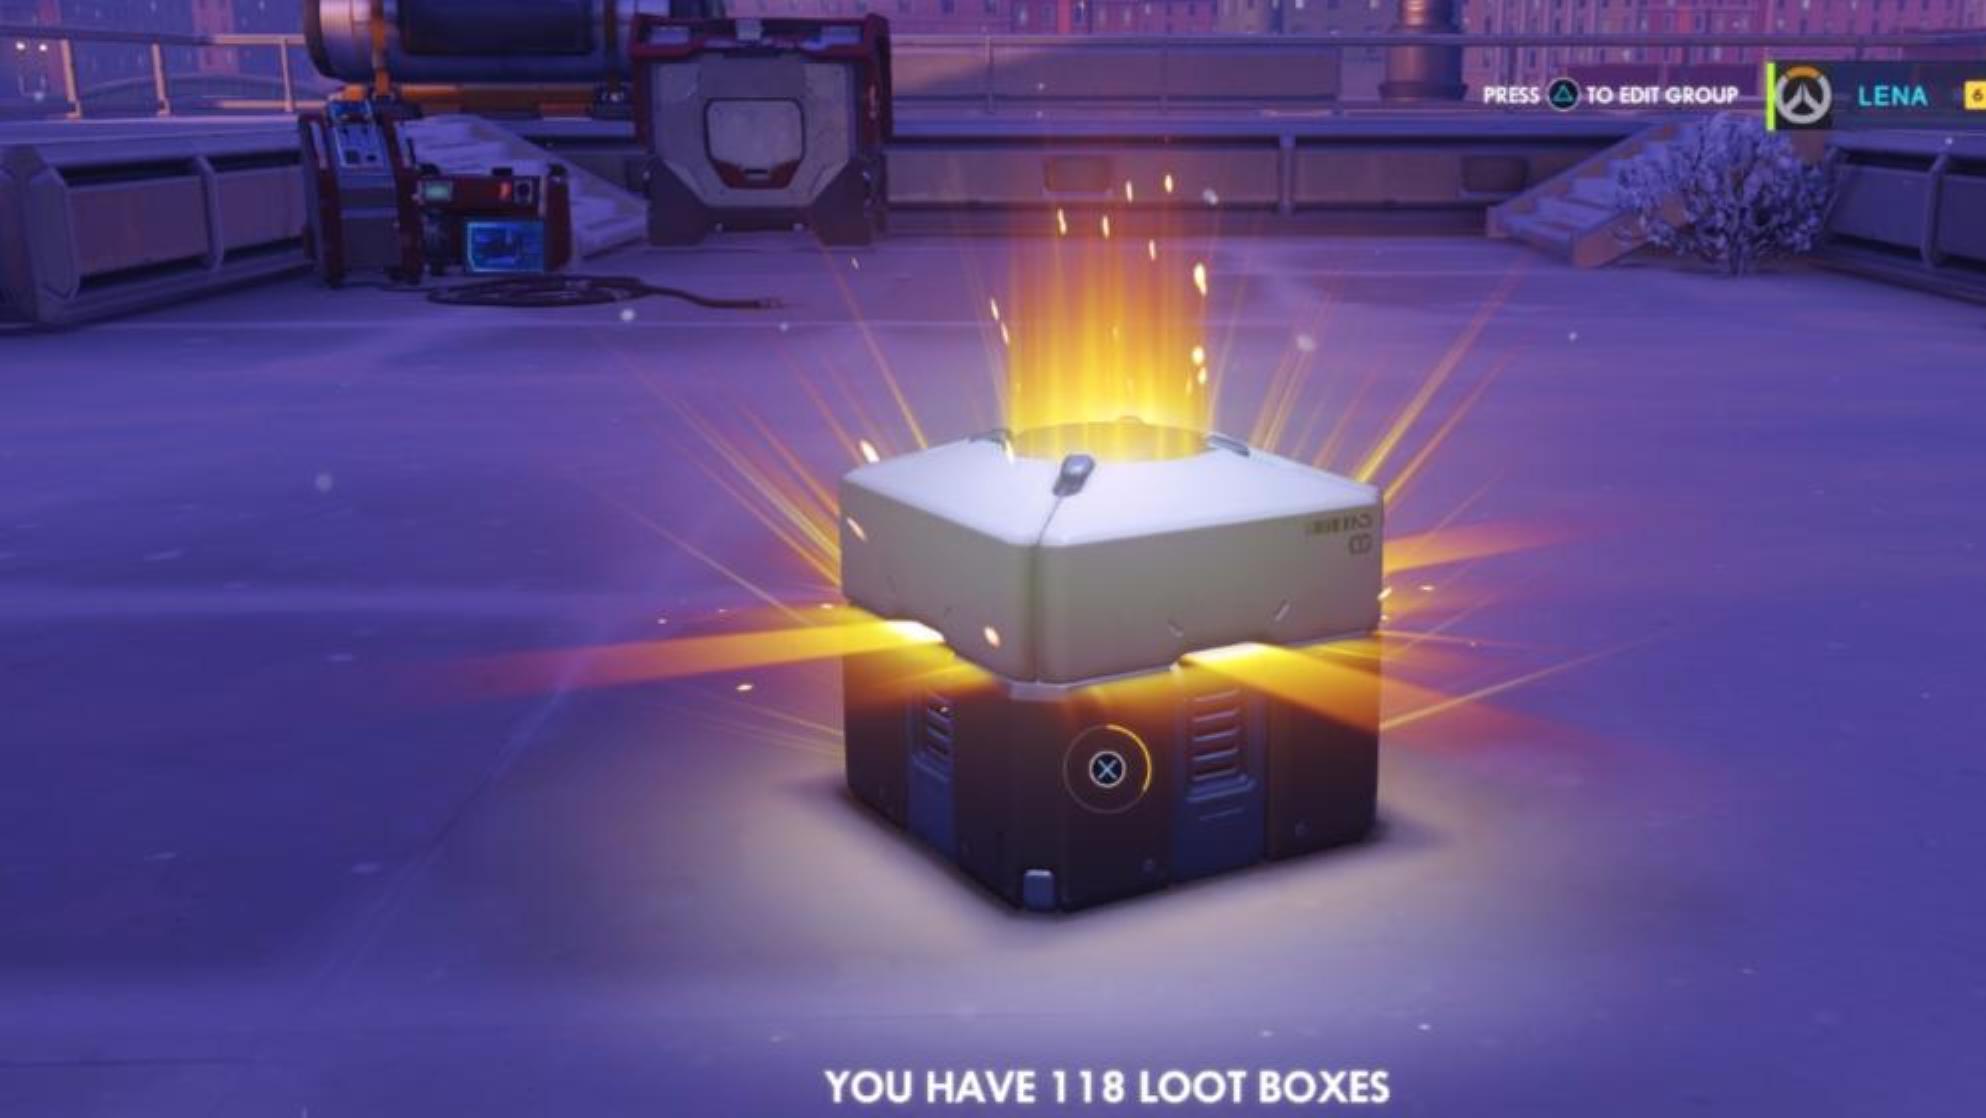 Regulierung der Lootboxen notwendig